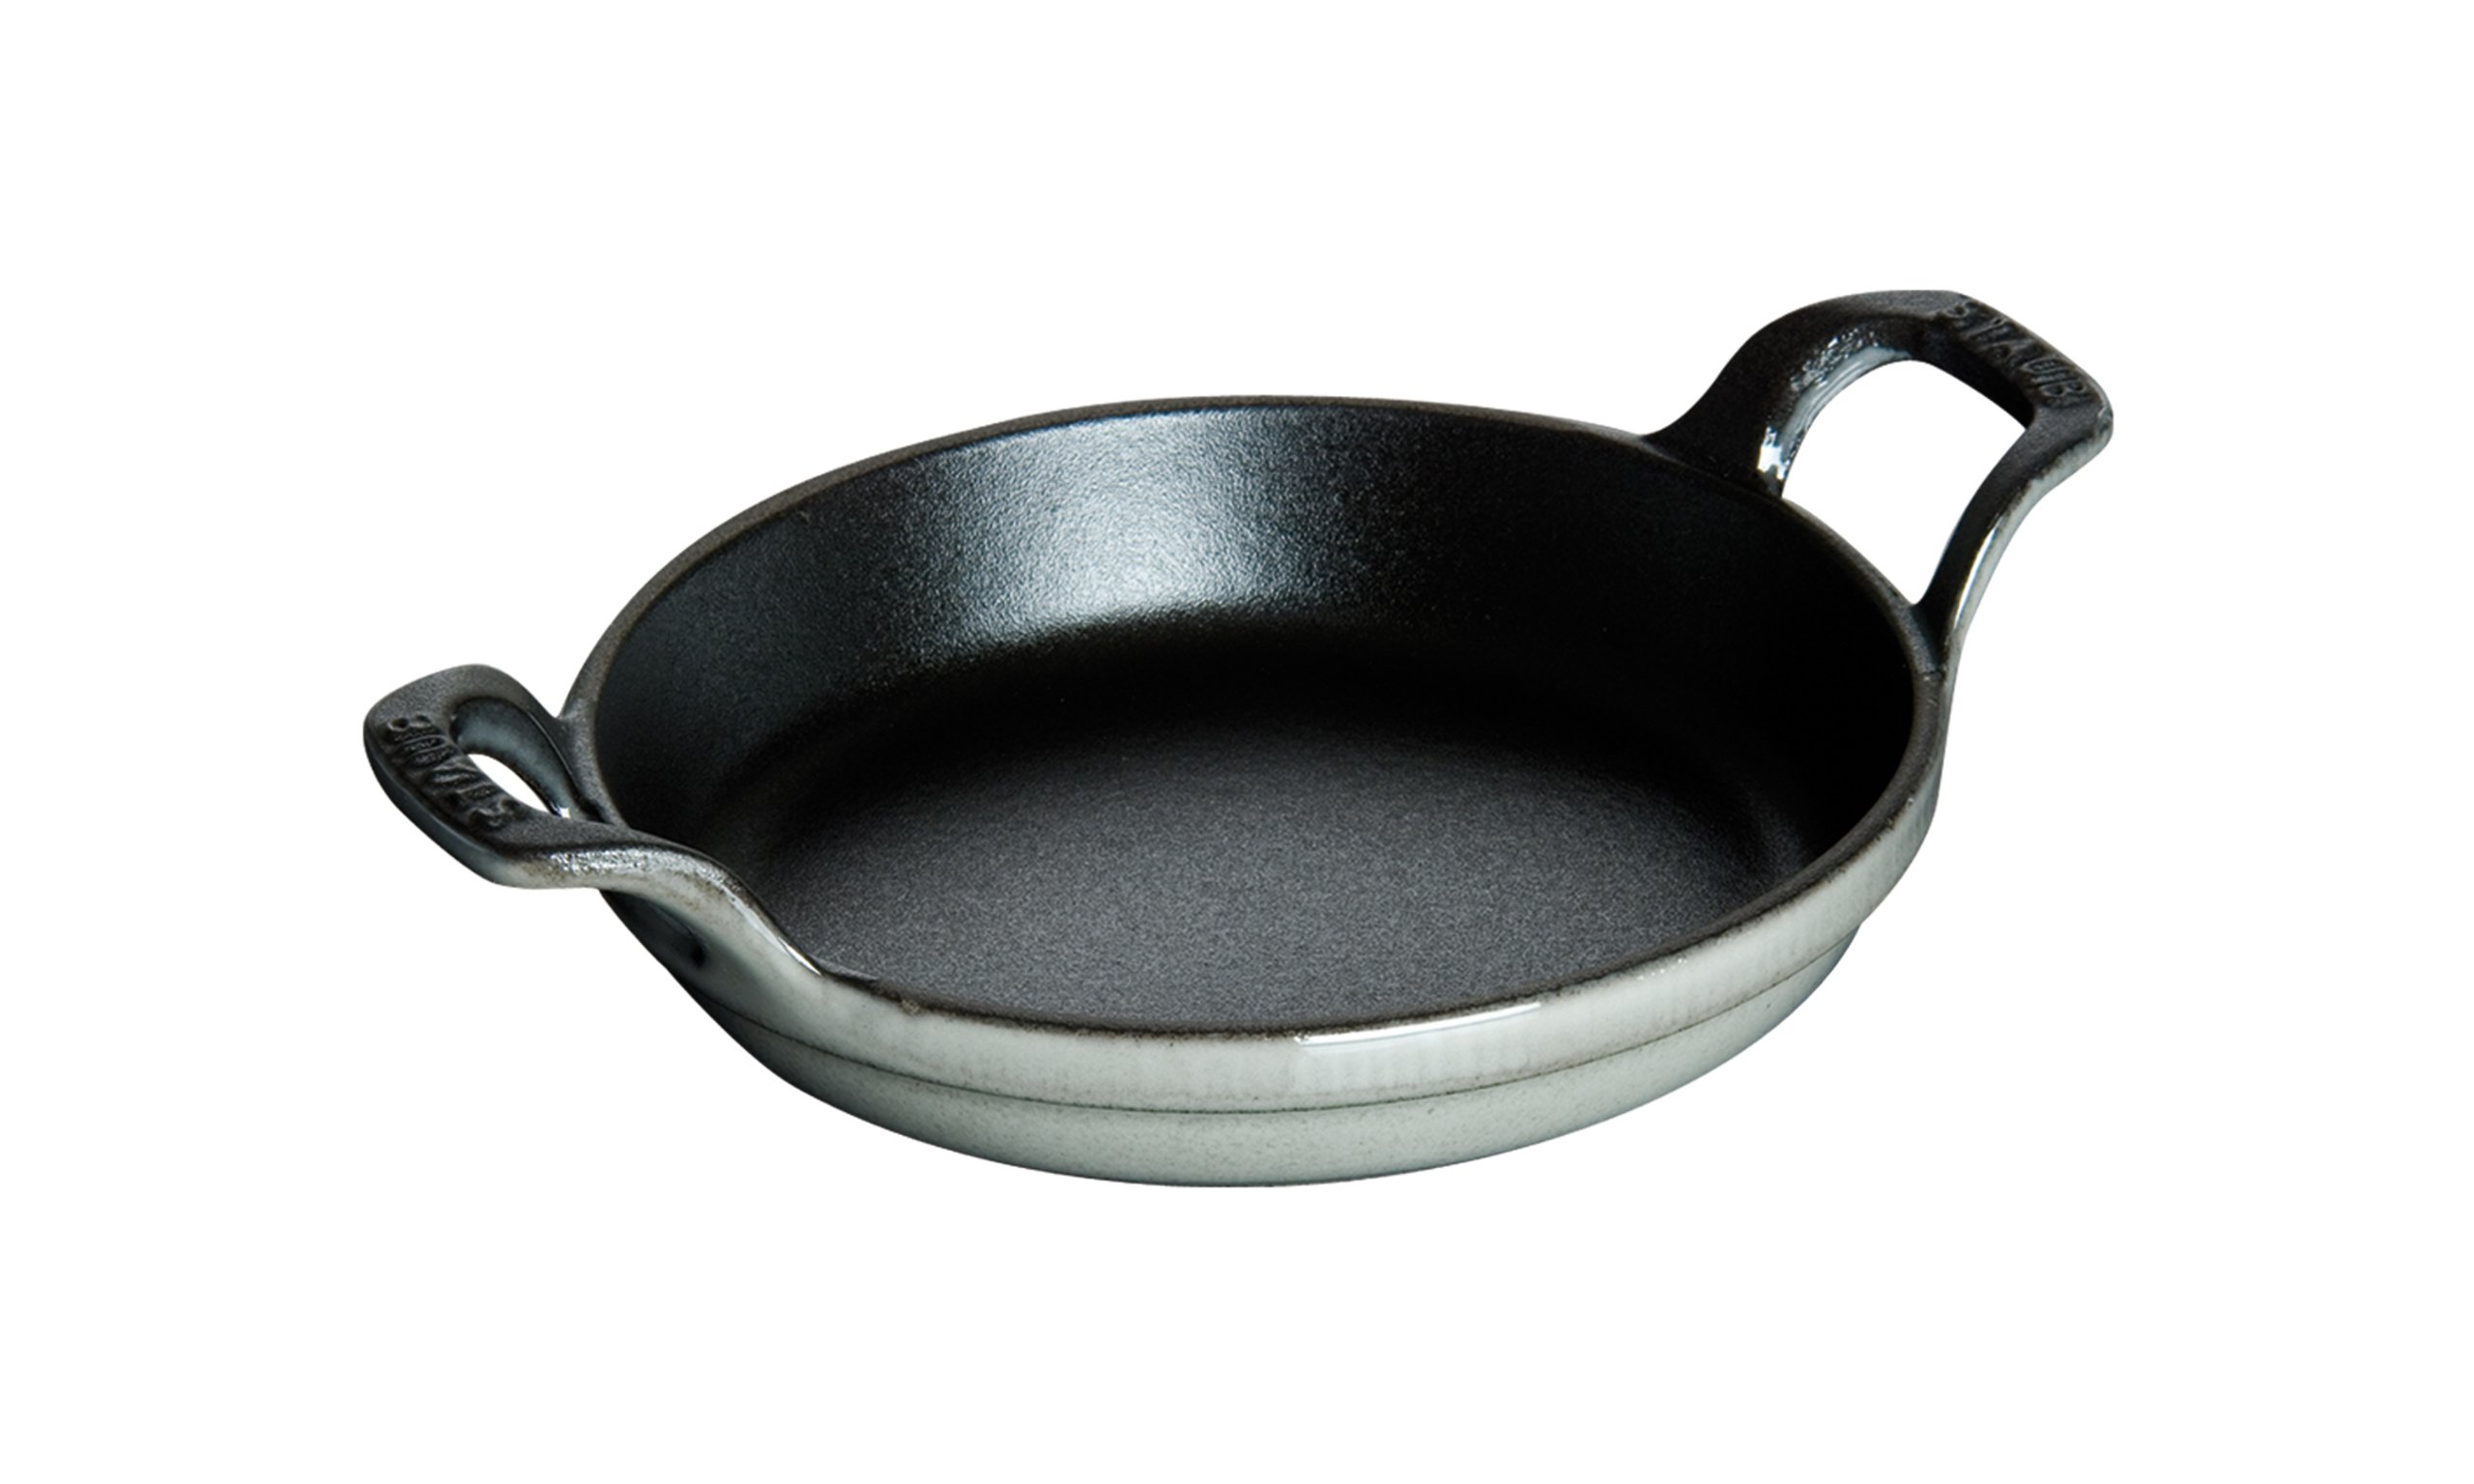 Staub 1302018 Round Roasting Dish, 20 cm, Graphite Grey